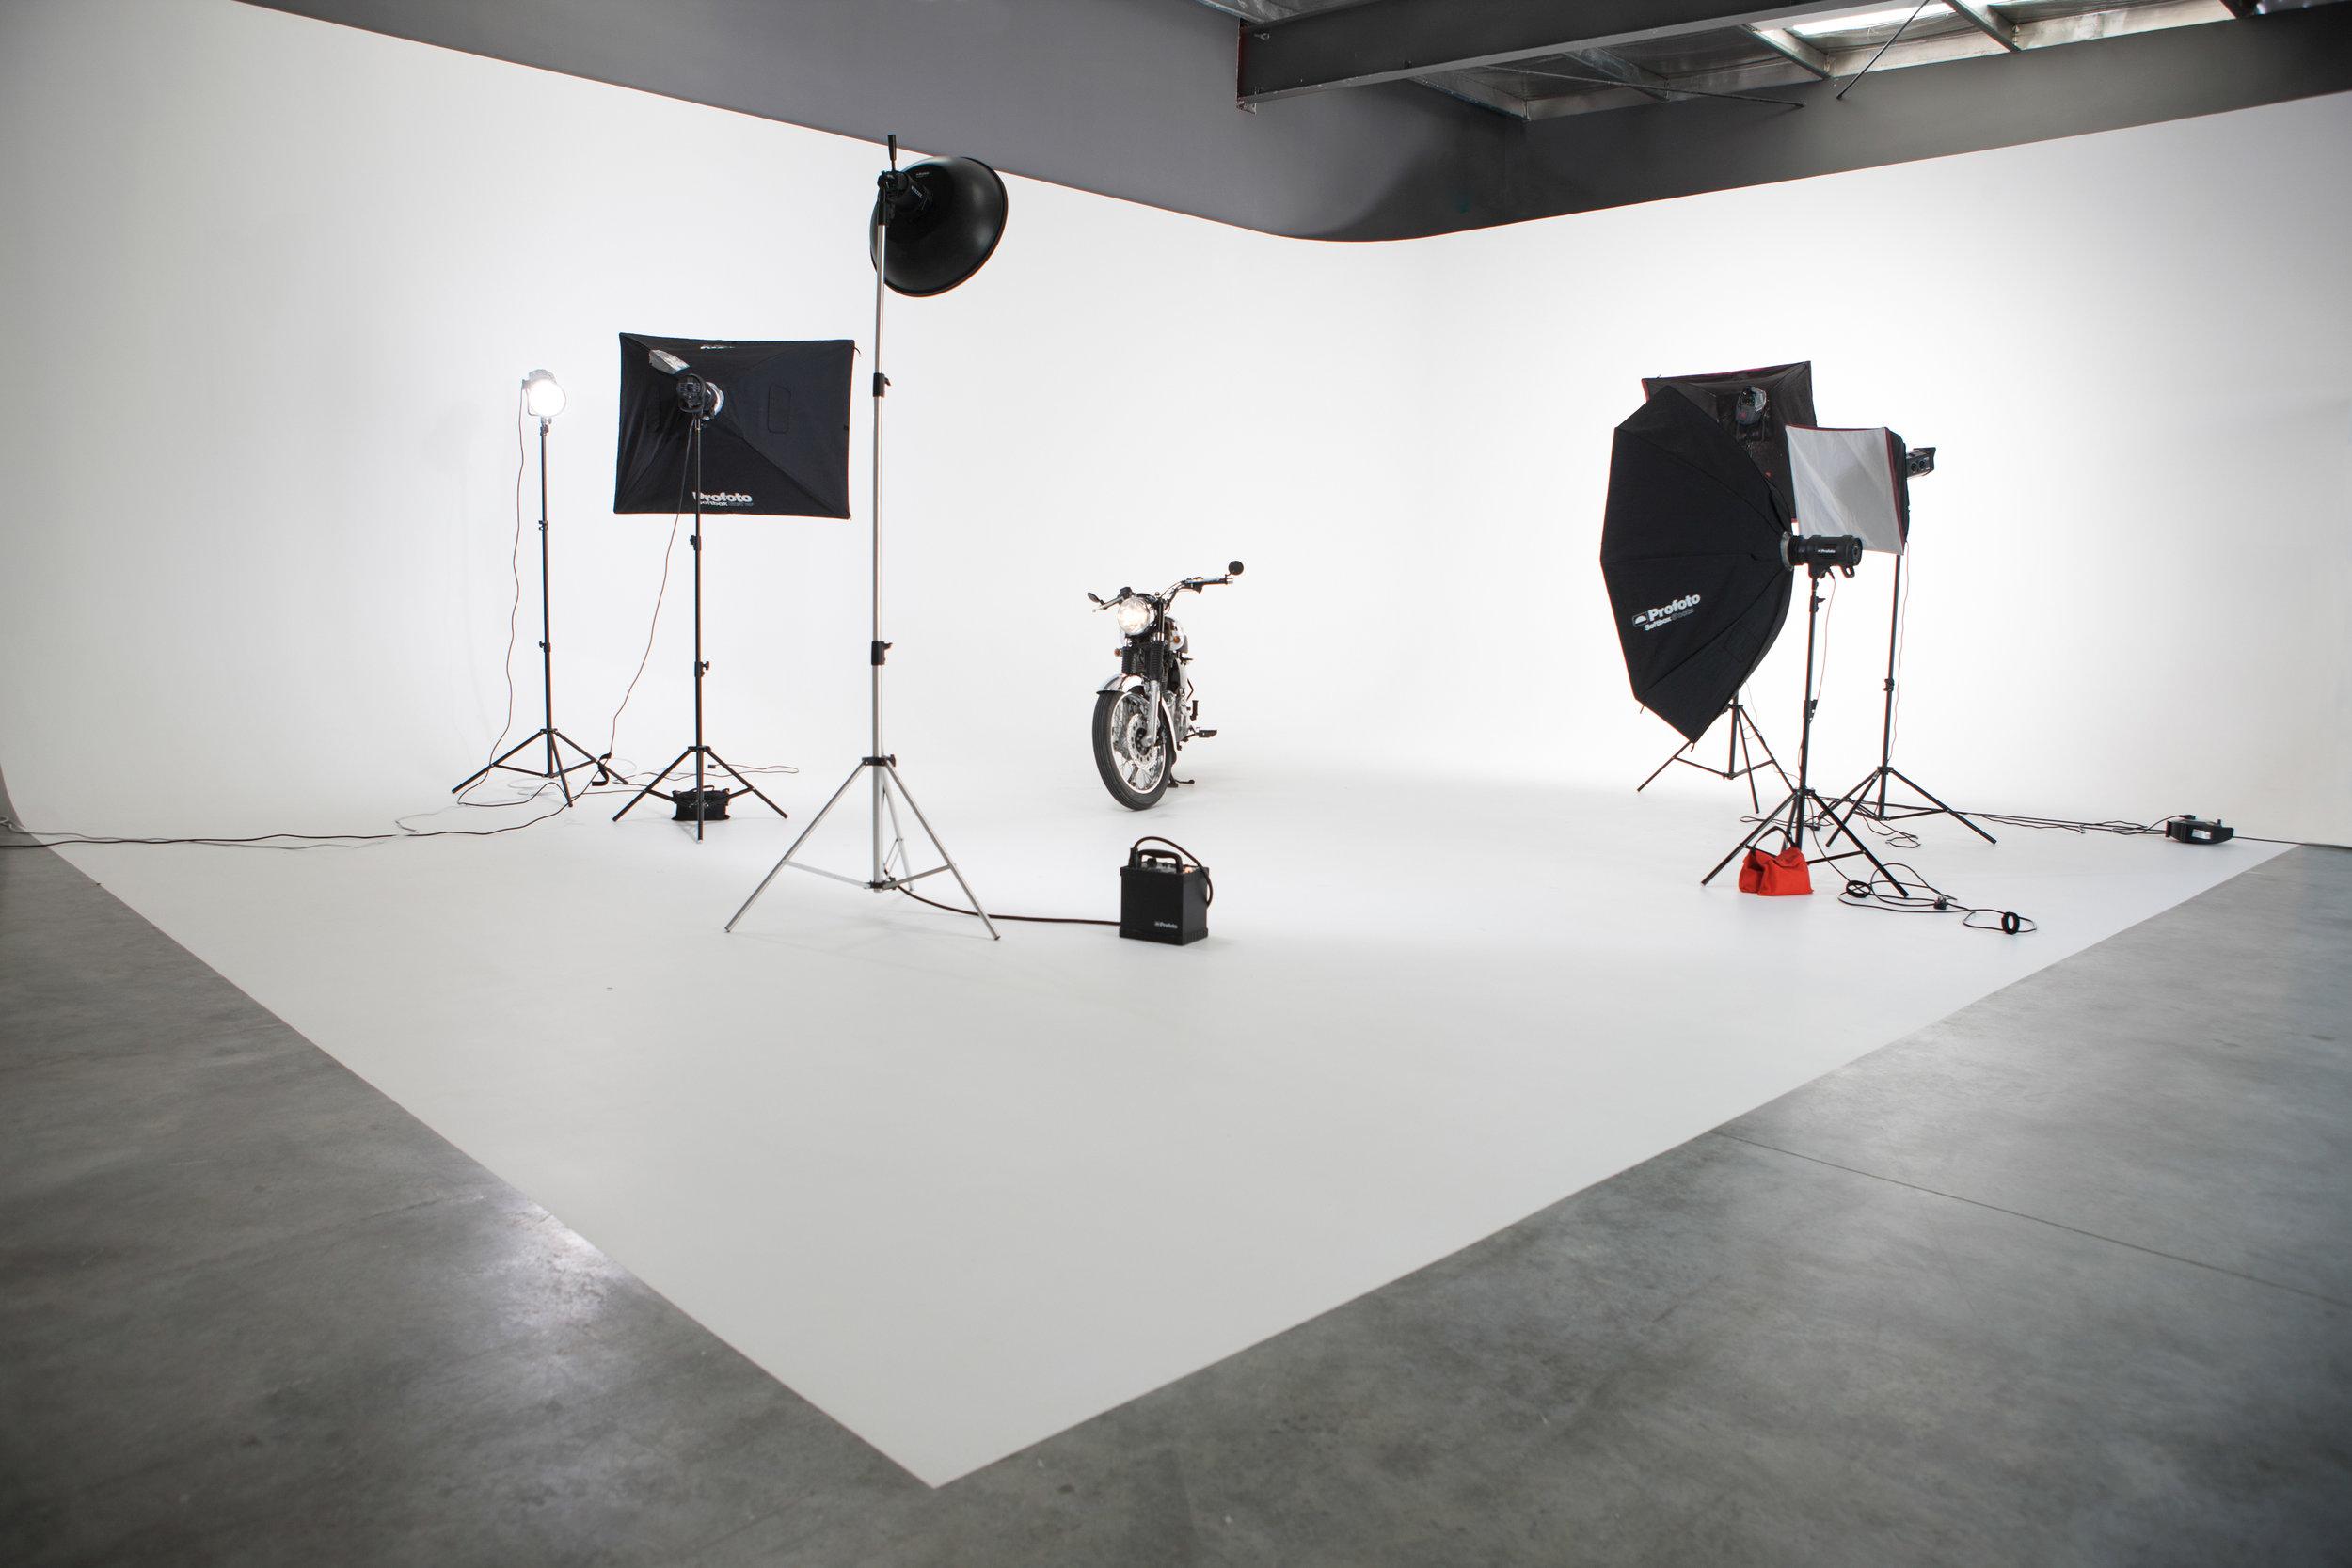 8th Street Studios -  Studio A 6 -bike.JPG